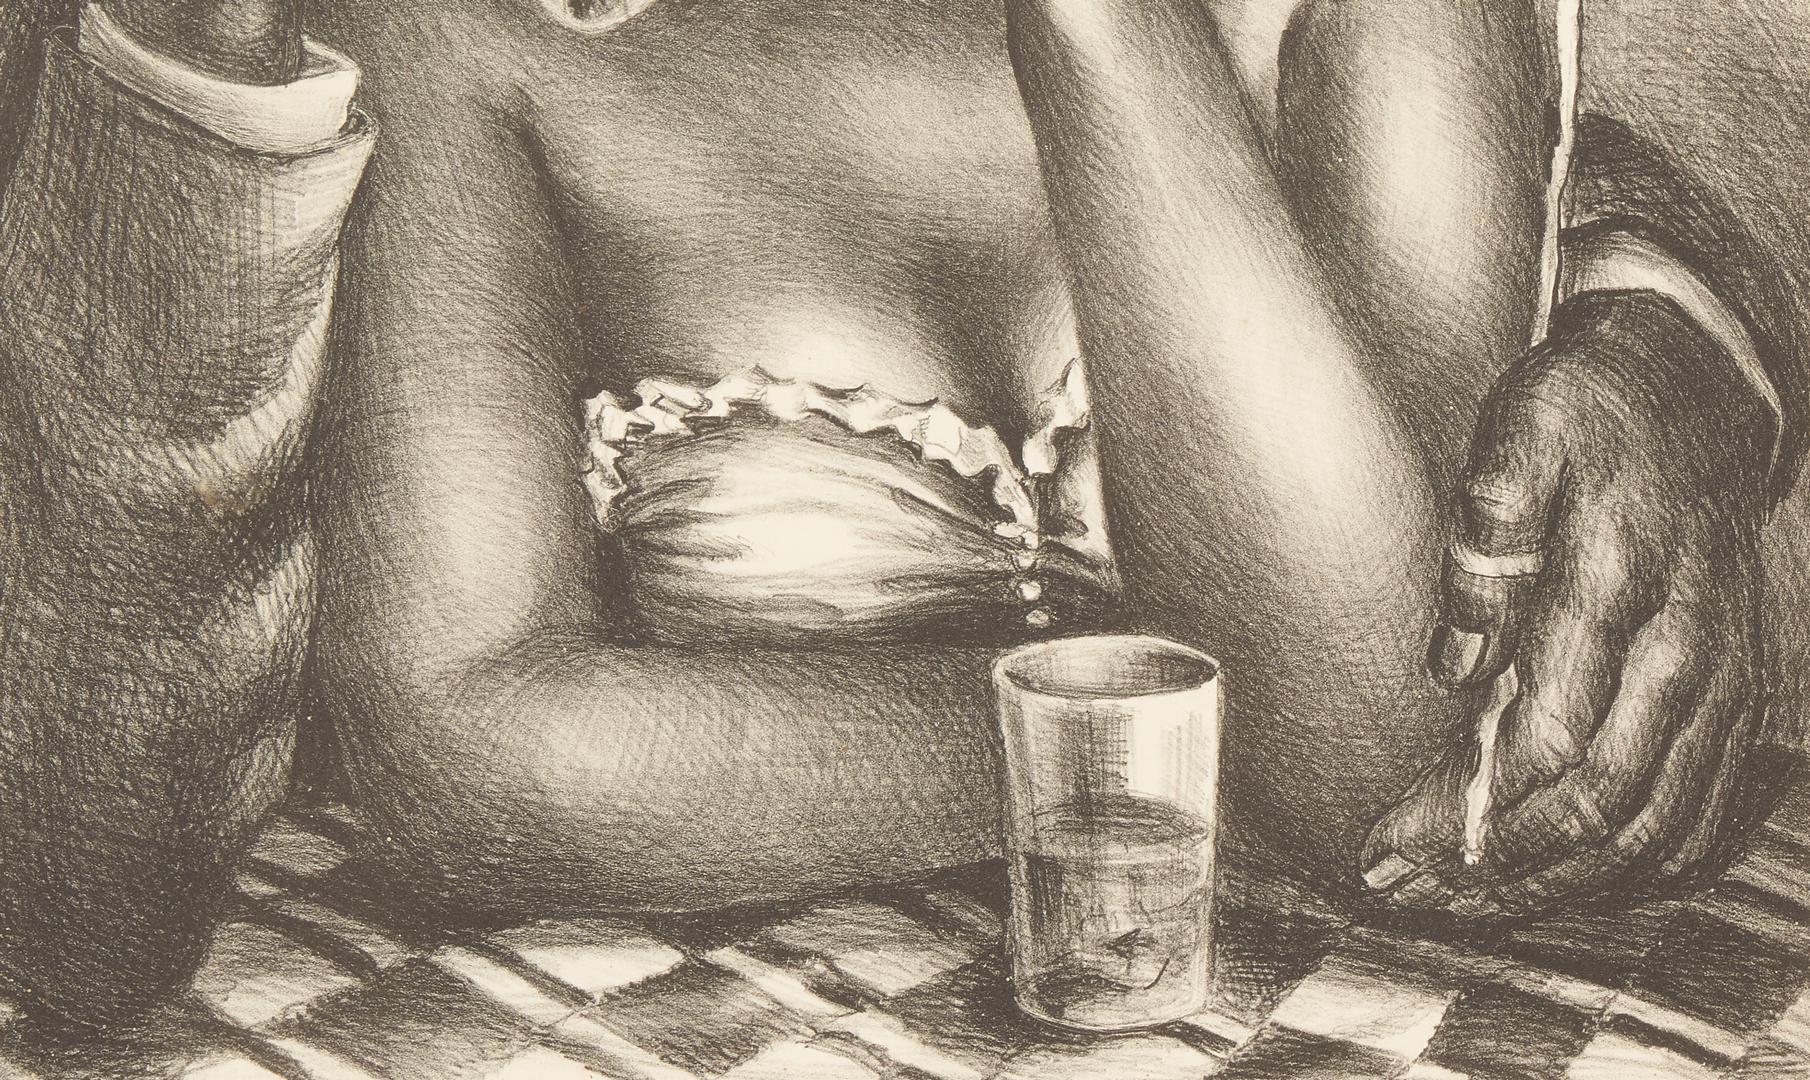 Lot 1152: 3 Prints: Marion Greenwood and Kathe Kollwitz